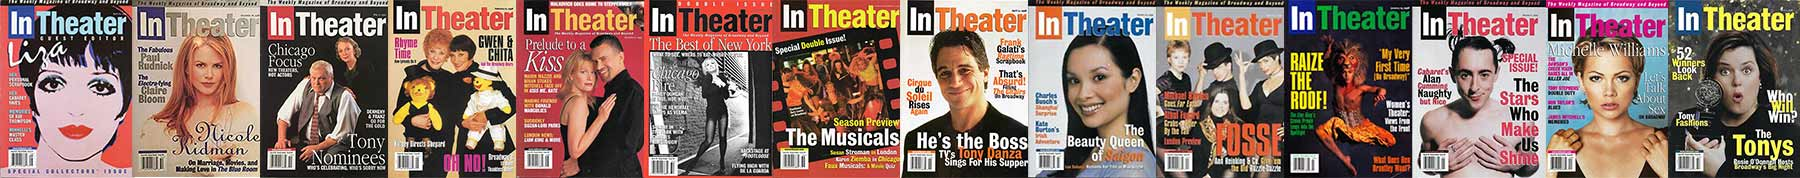 InTheater Magazine